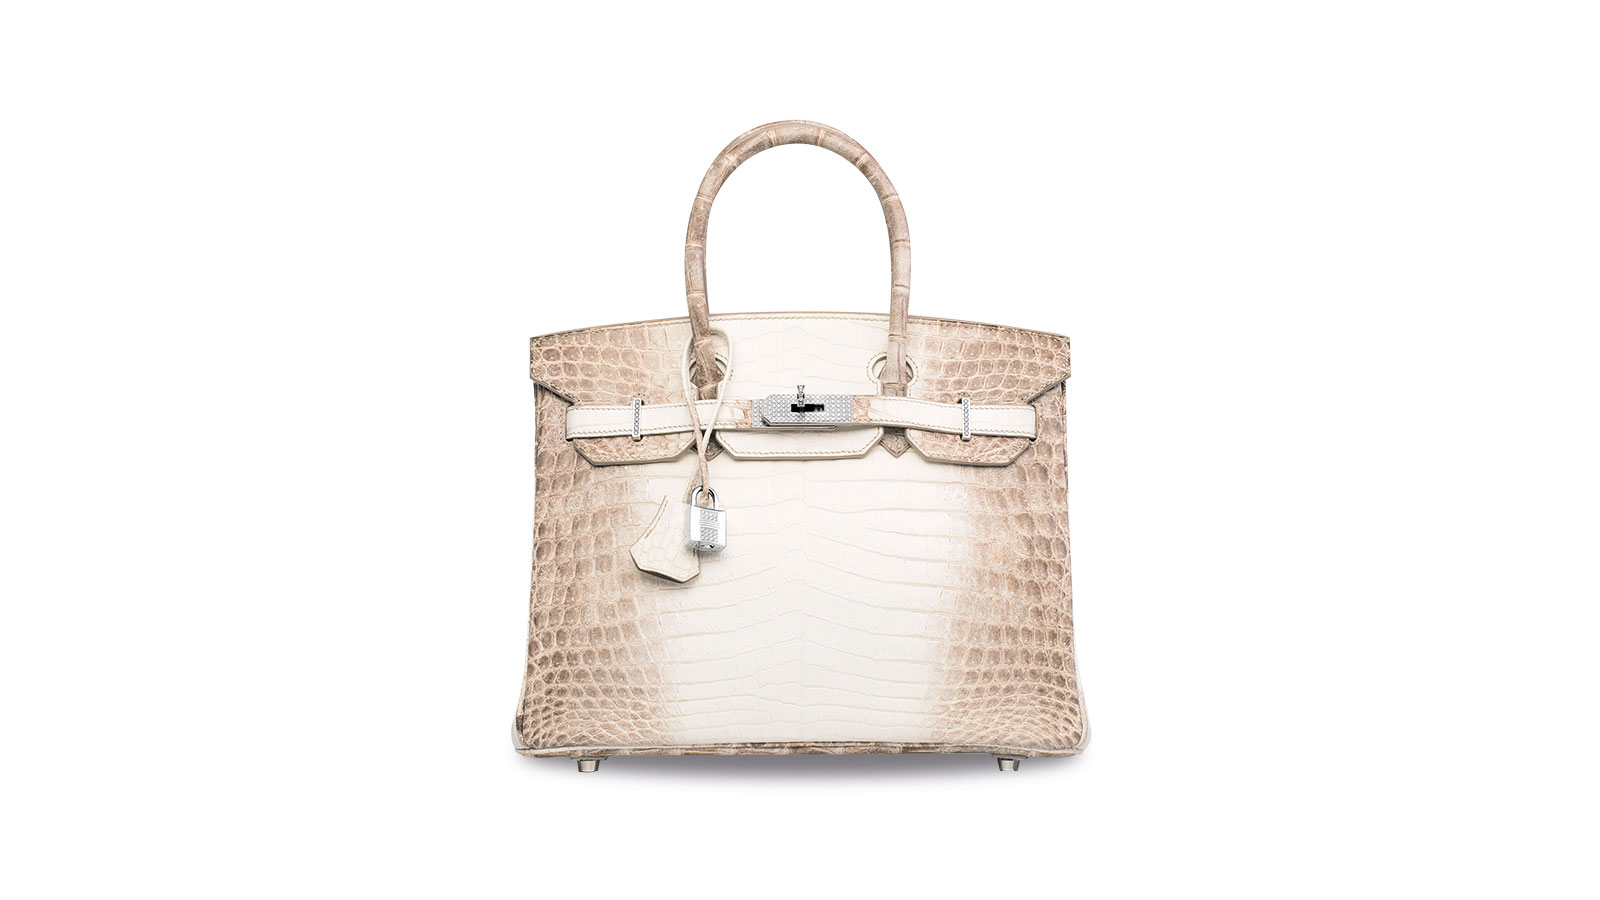 46d6eb799459 The most expensive handbag ever sold  Diamond-encrusted Hermes Birkin sells  for over  300K